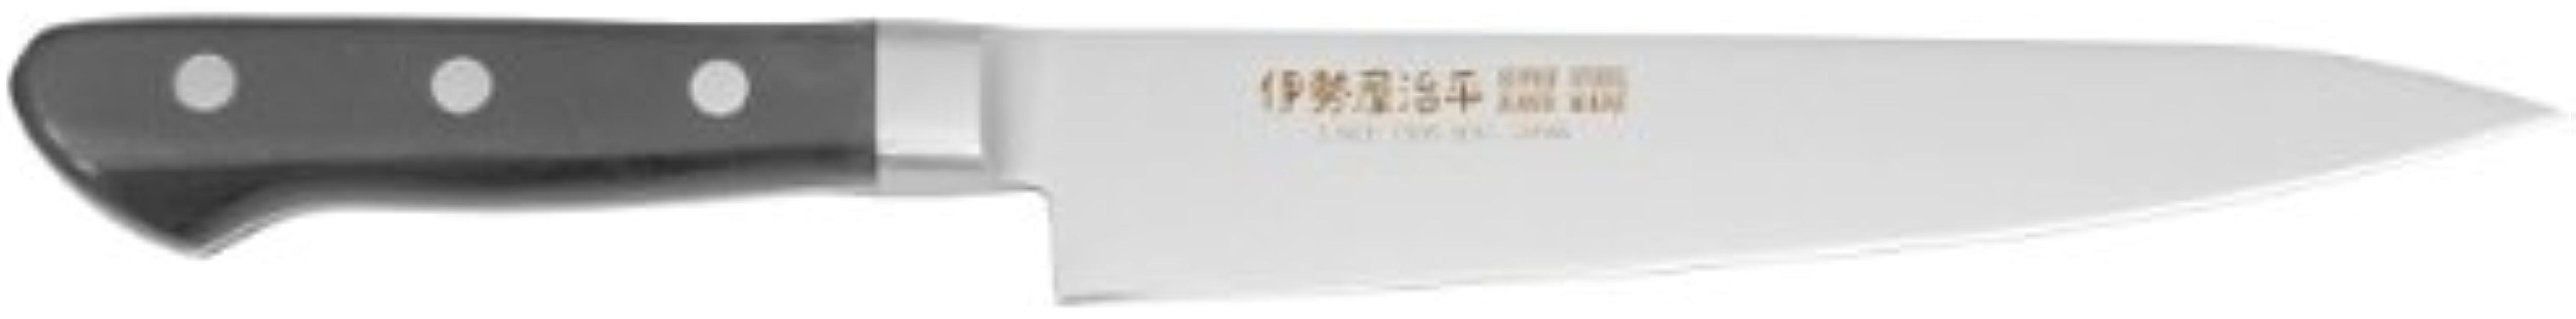 SETO Japanese Chef Knives Forged Steel Japan PRO Model Slicer 200 M M P